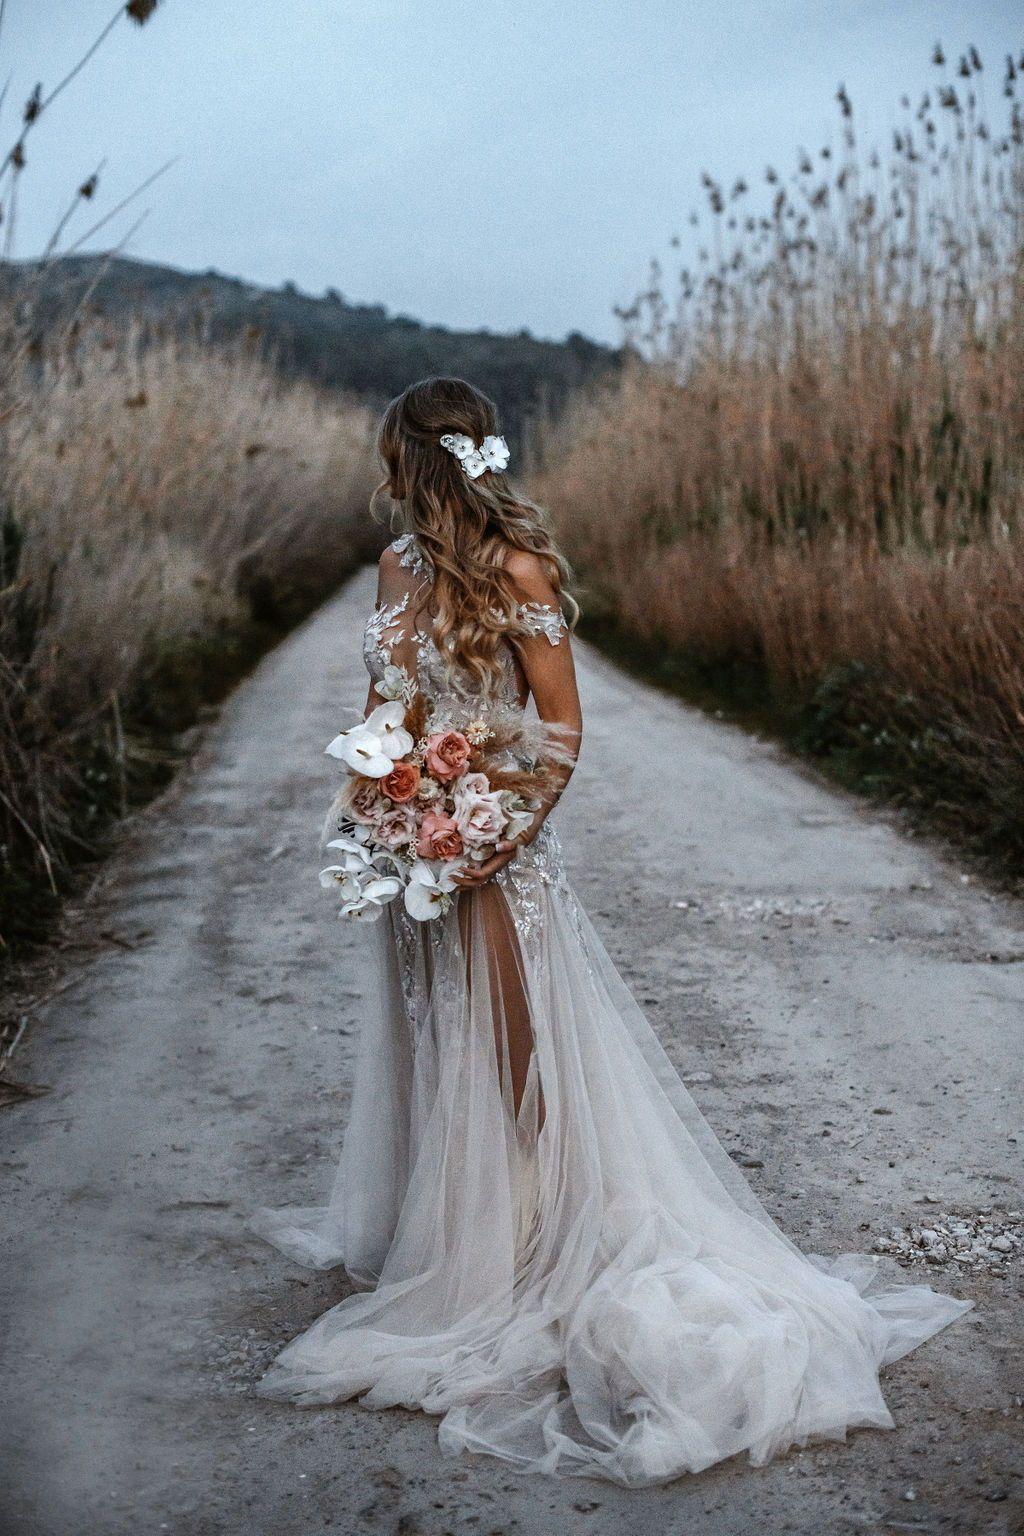 G 301 Collection No Viii Bridal Dresses Galia Lahav Country Wedding Dresses Dream Wedding Dresses Western Wedding Dresses [ 1536 x 1024 Pixel ]